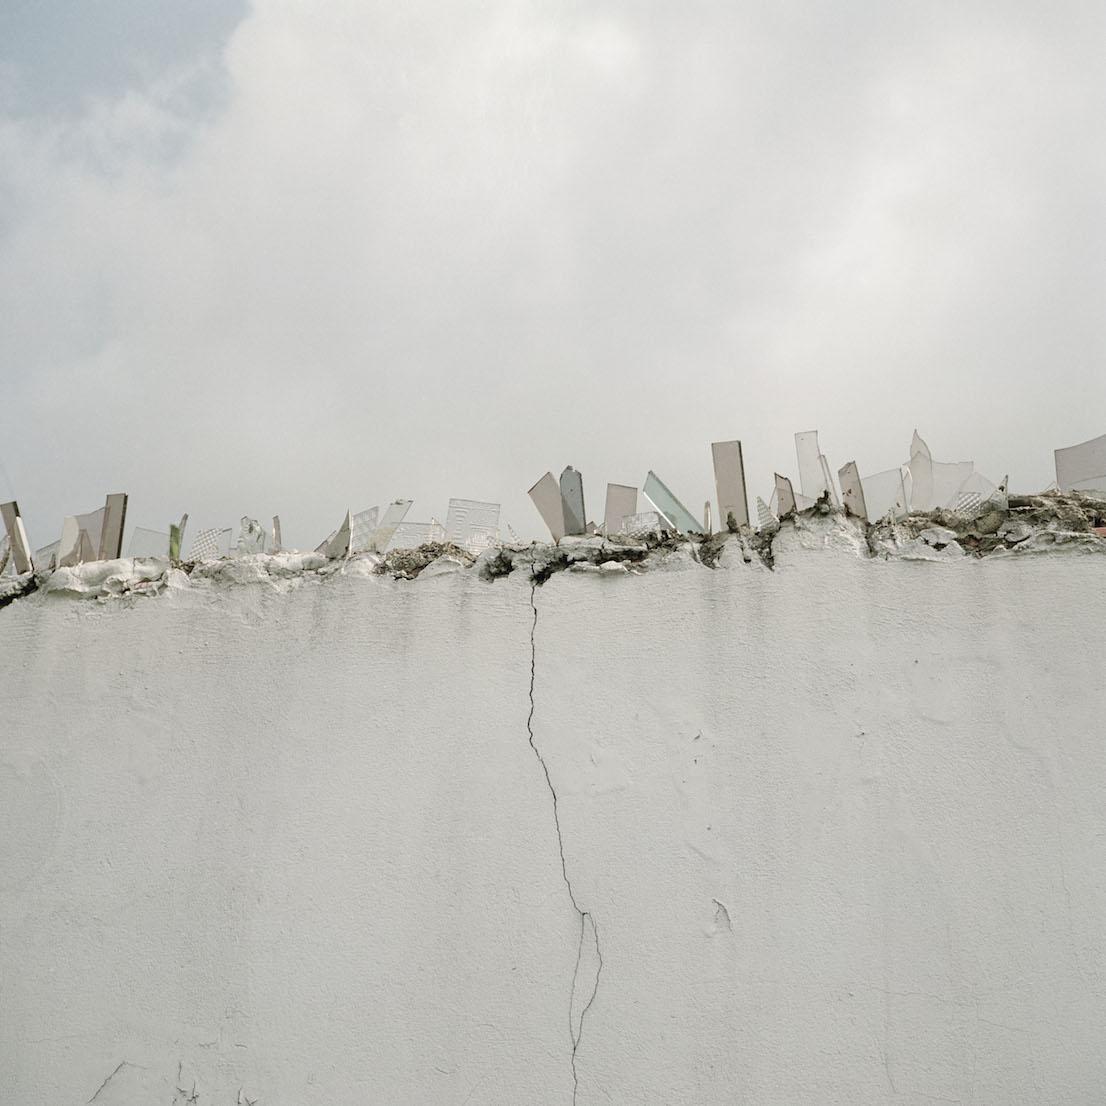 Alec Soth, Untitled 25, Bogotá (broken glass wall), 2003.